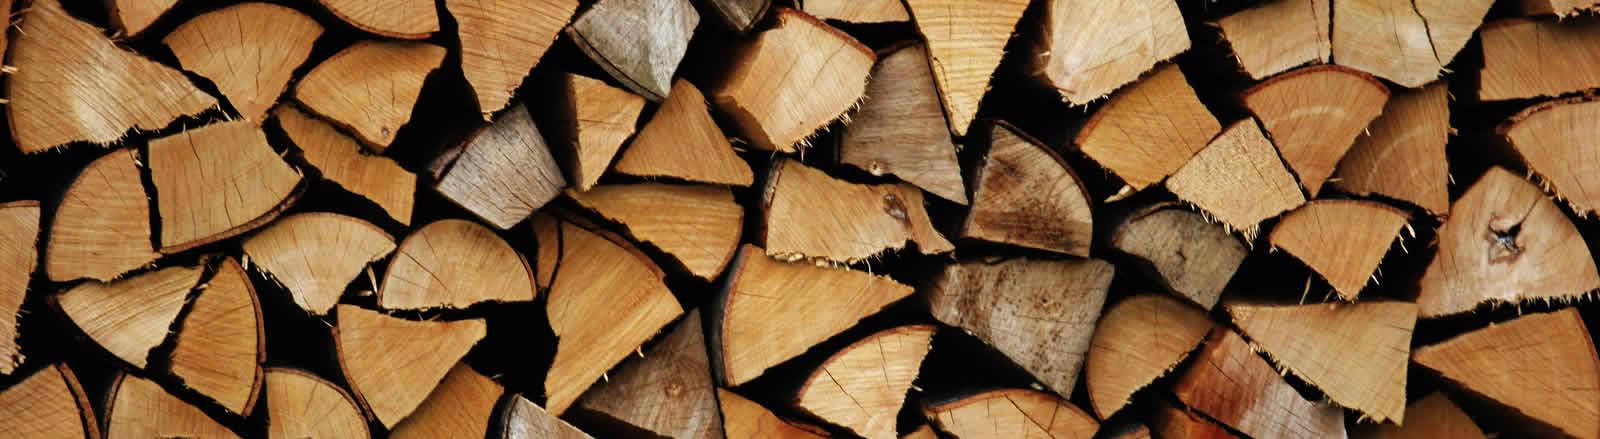 firewood-header